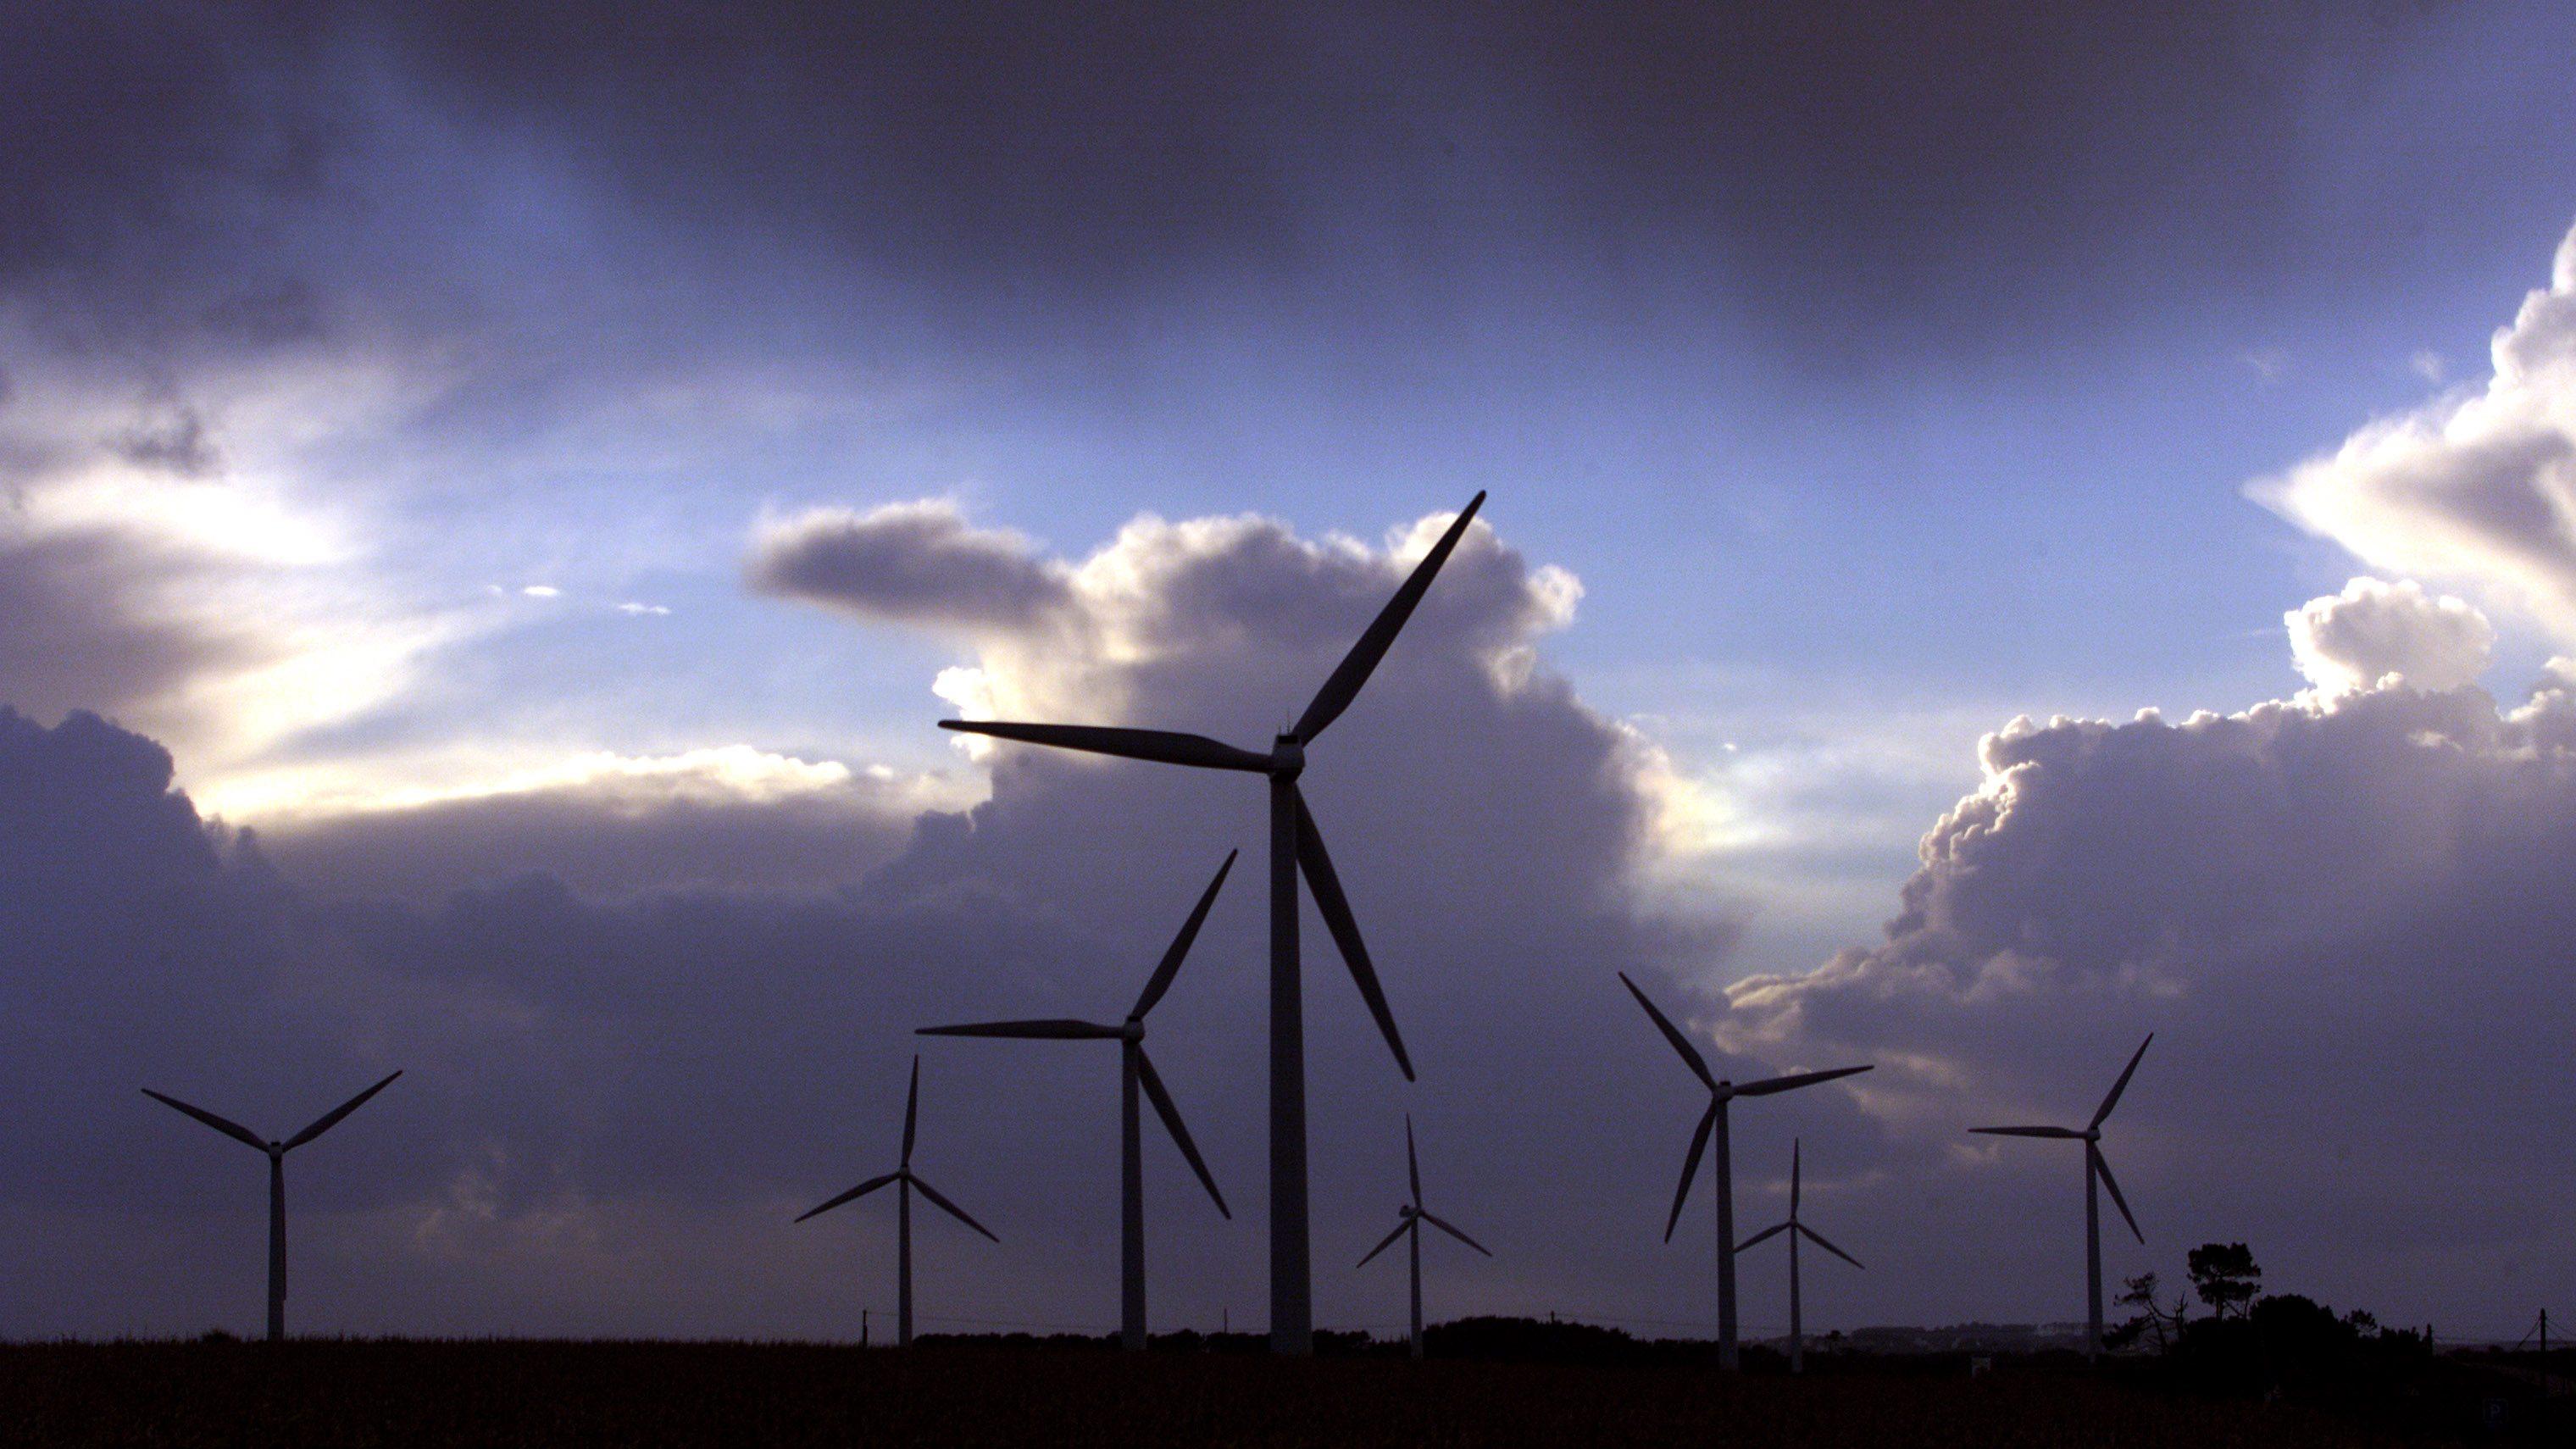 andhra-pradesh-renewable-solar-wind-jaganmohan-ppa-tariff